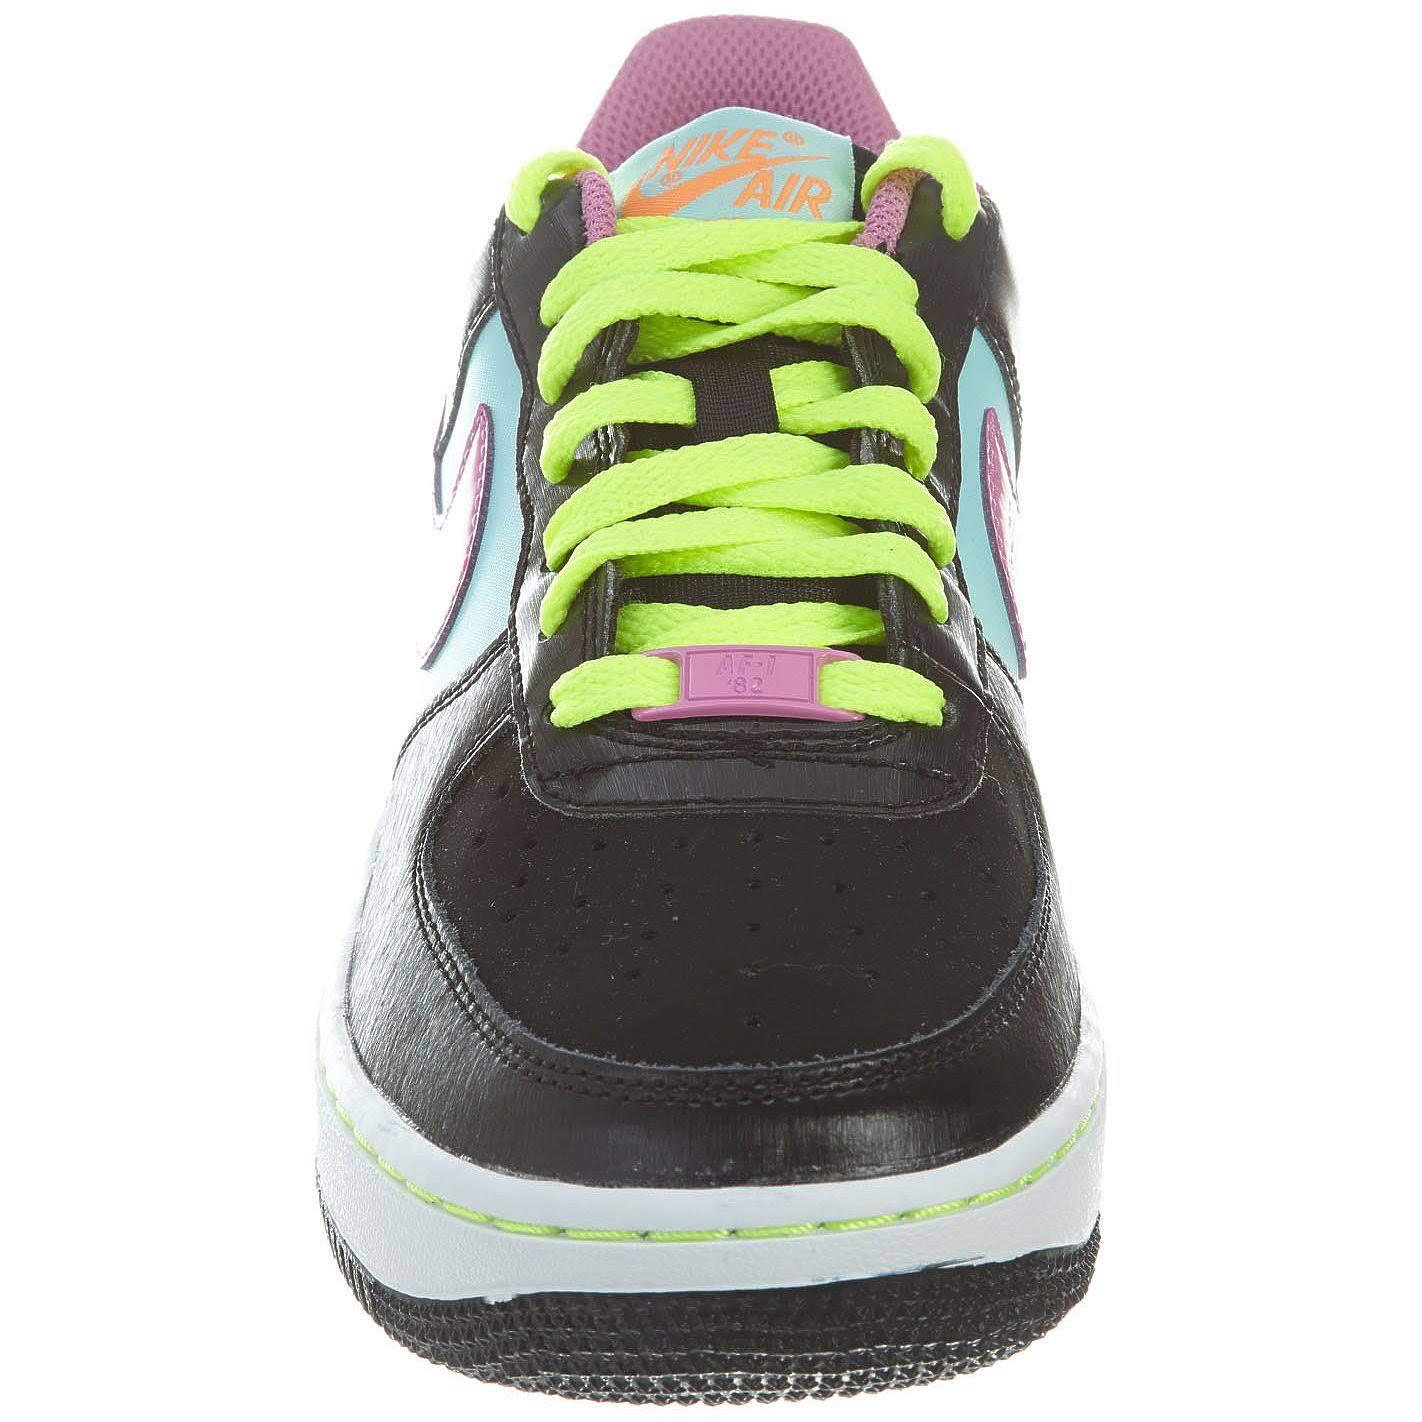 7 Style Big Kids Nike 009 314219 Force gs Air Tamaño 1 qPYv1